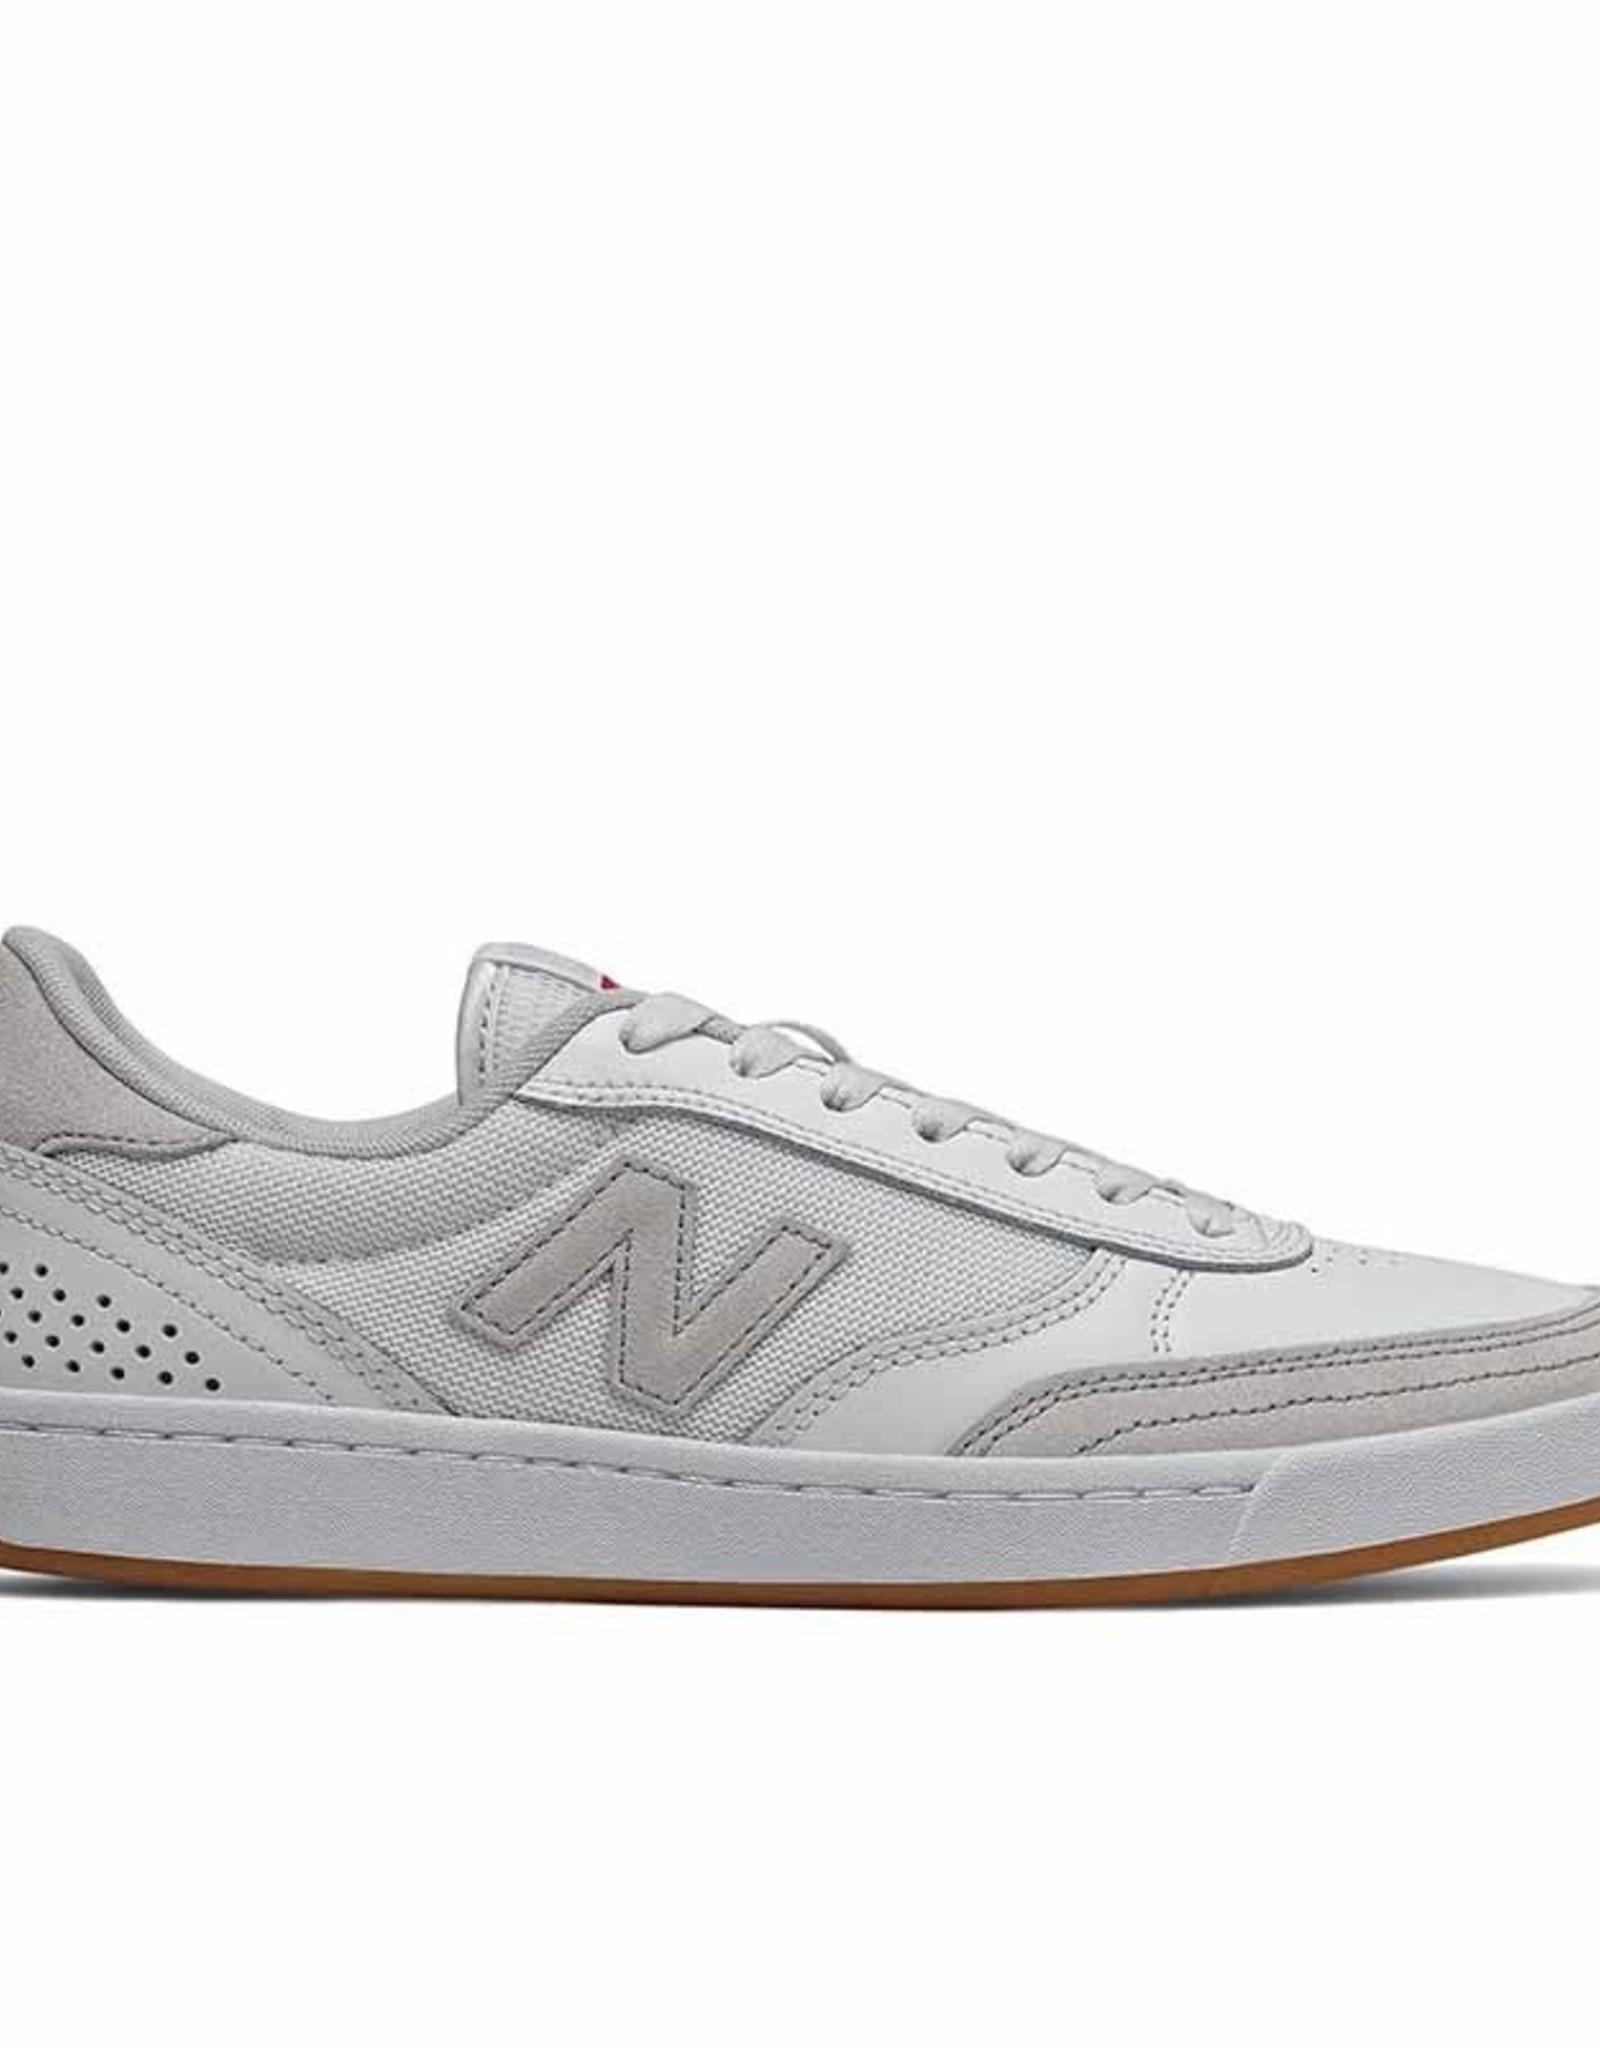 New Balance Numeric shoes 440